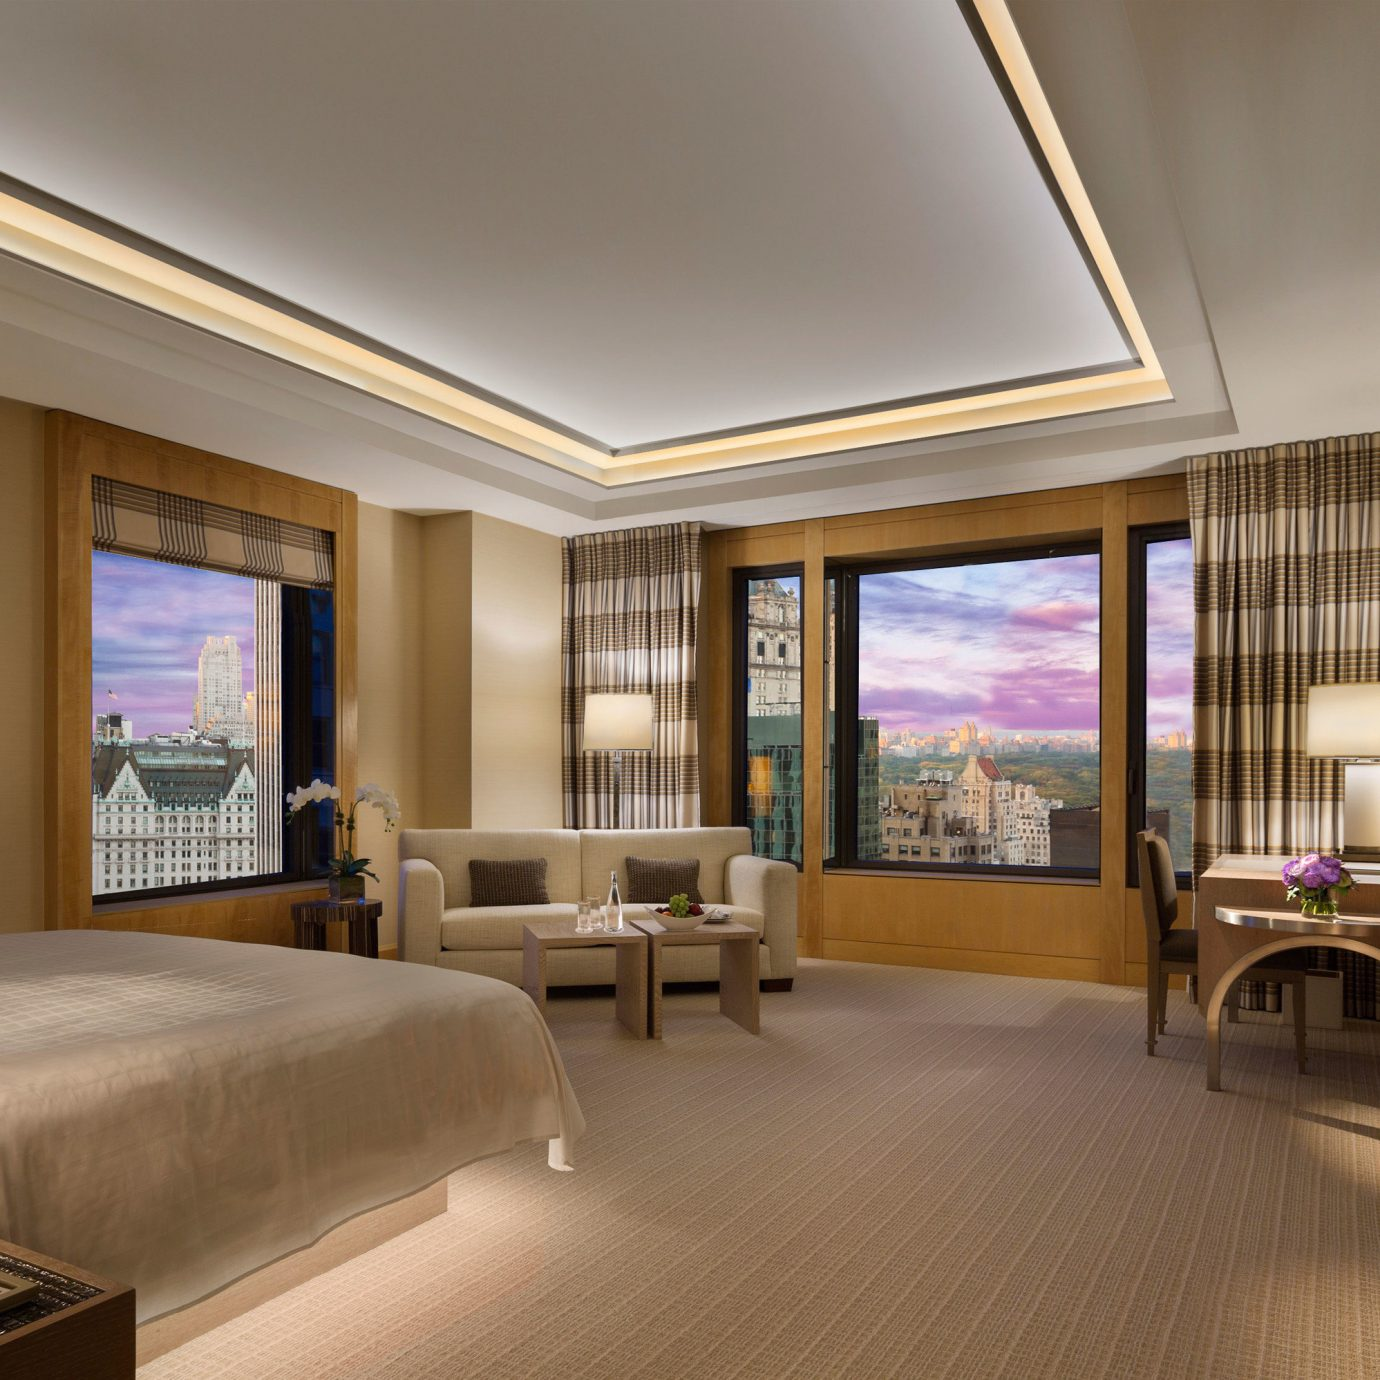 sofa property living room Lobby condominium home Suite mansion Bedroom